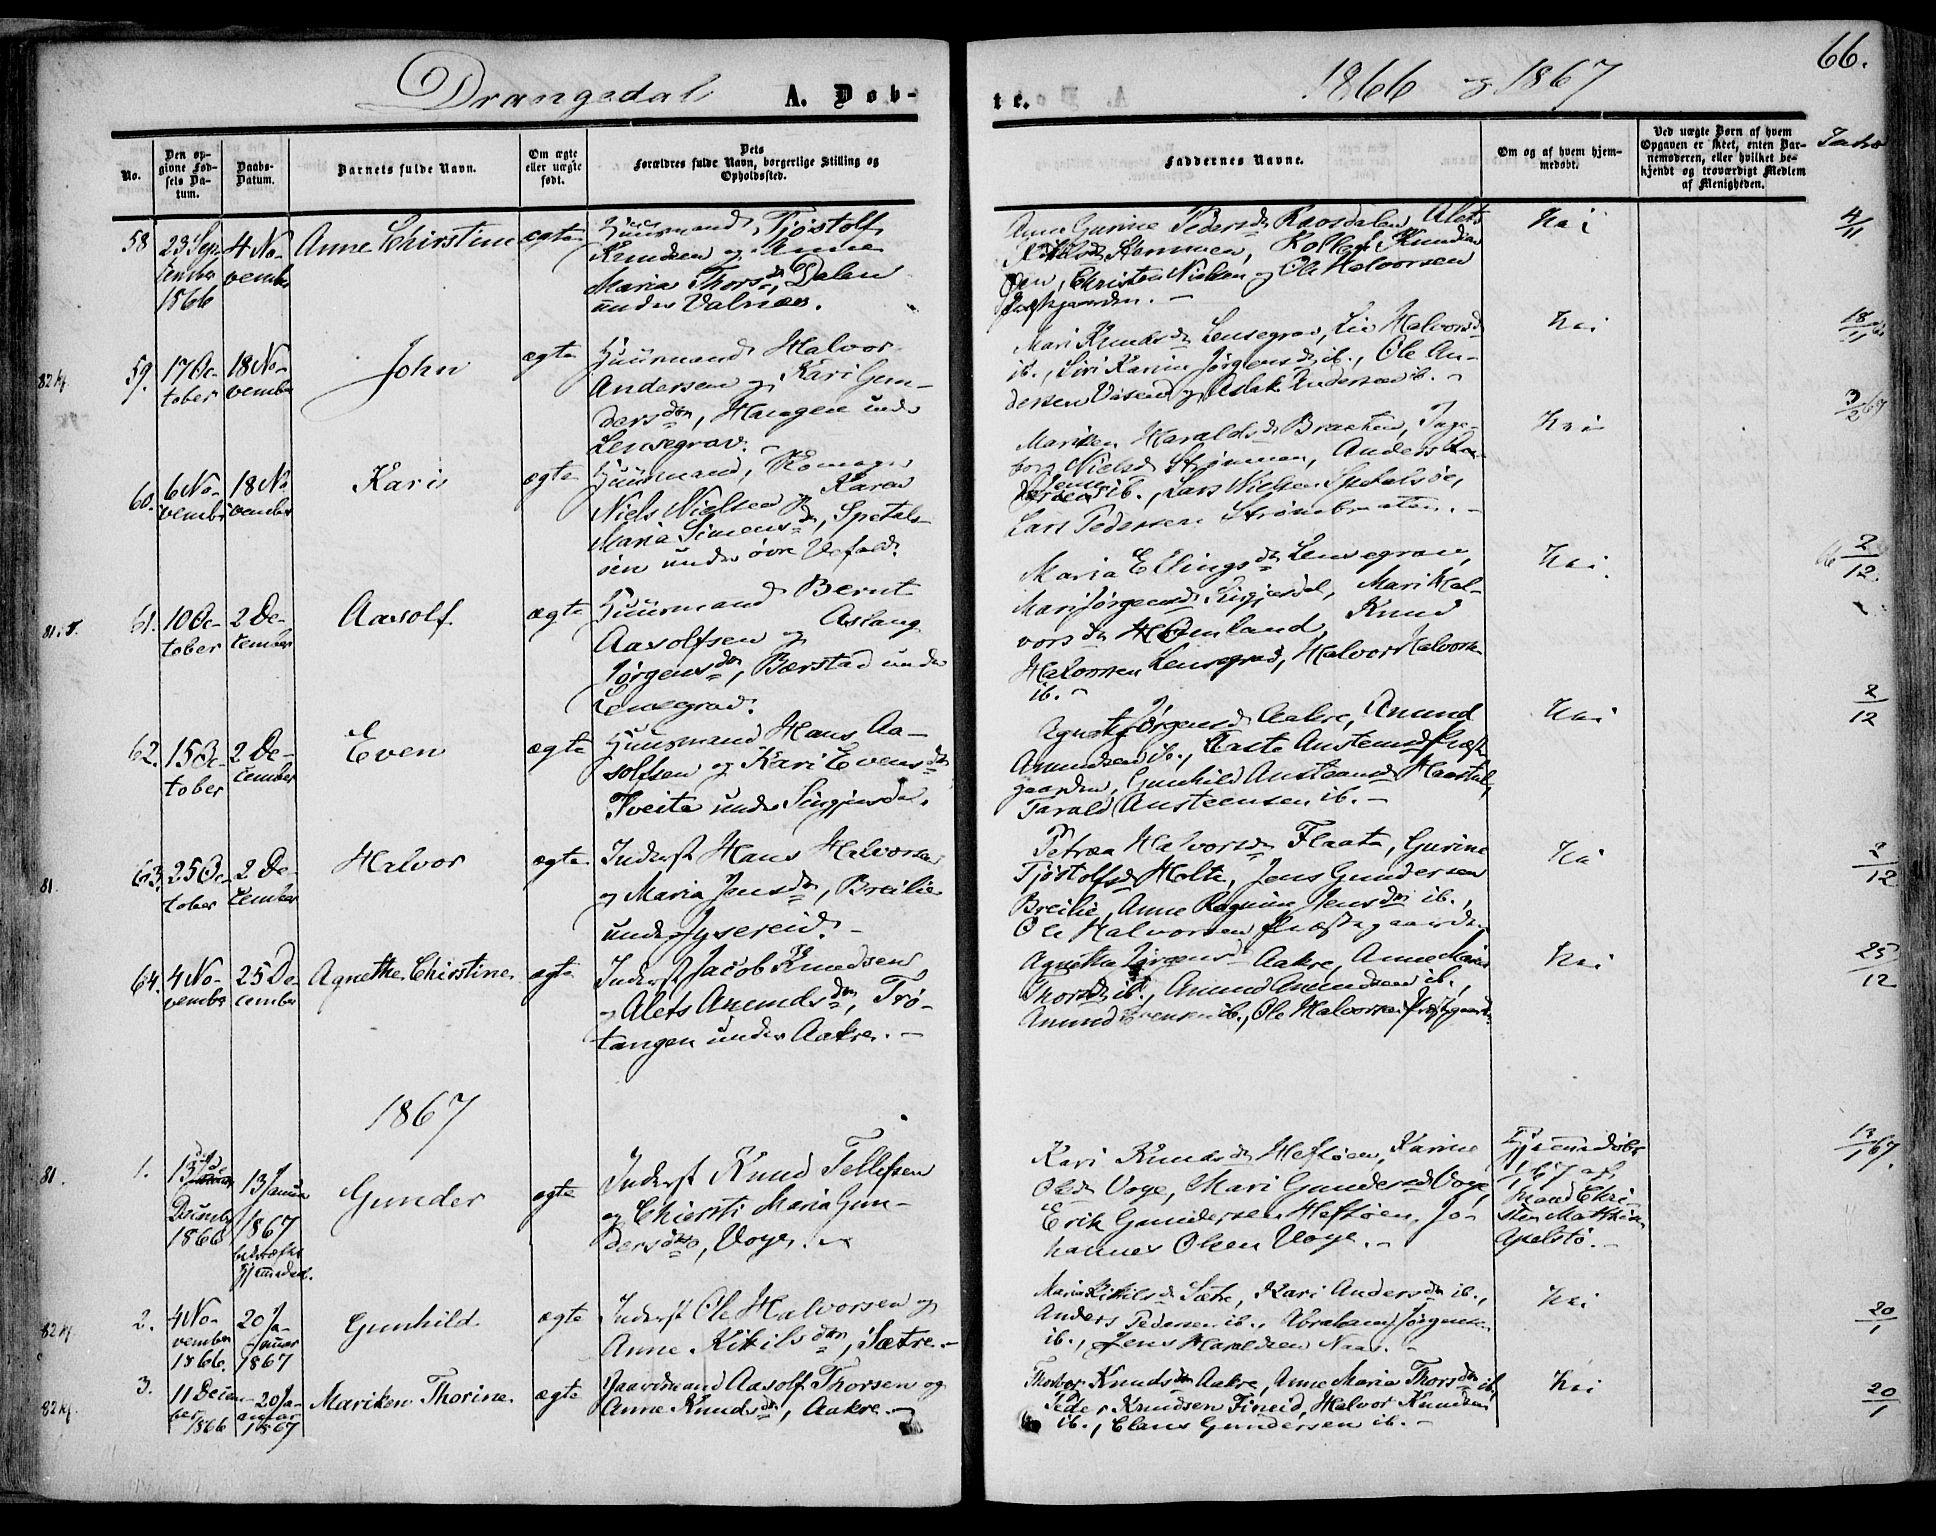 SAKO, Drangedal kirkebøker, F/Fa/L0008: Ministerialbok nr. 8, 1857-1871, s. 66